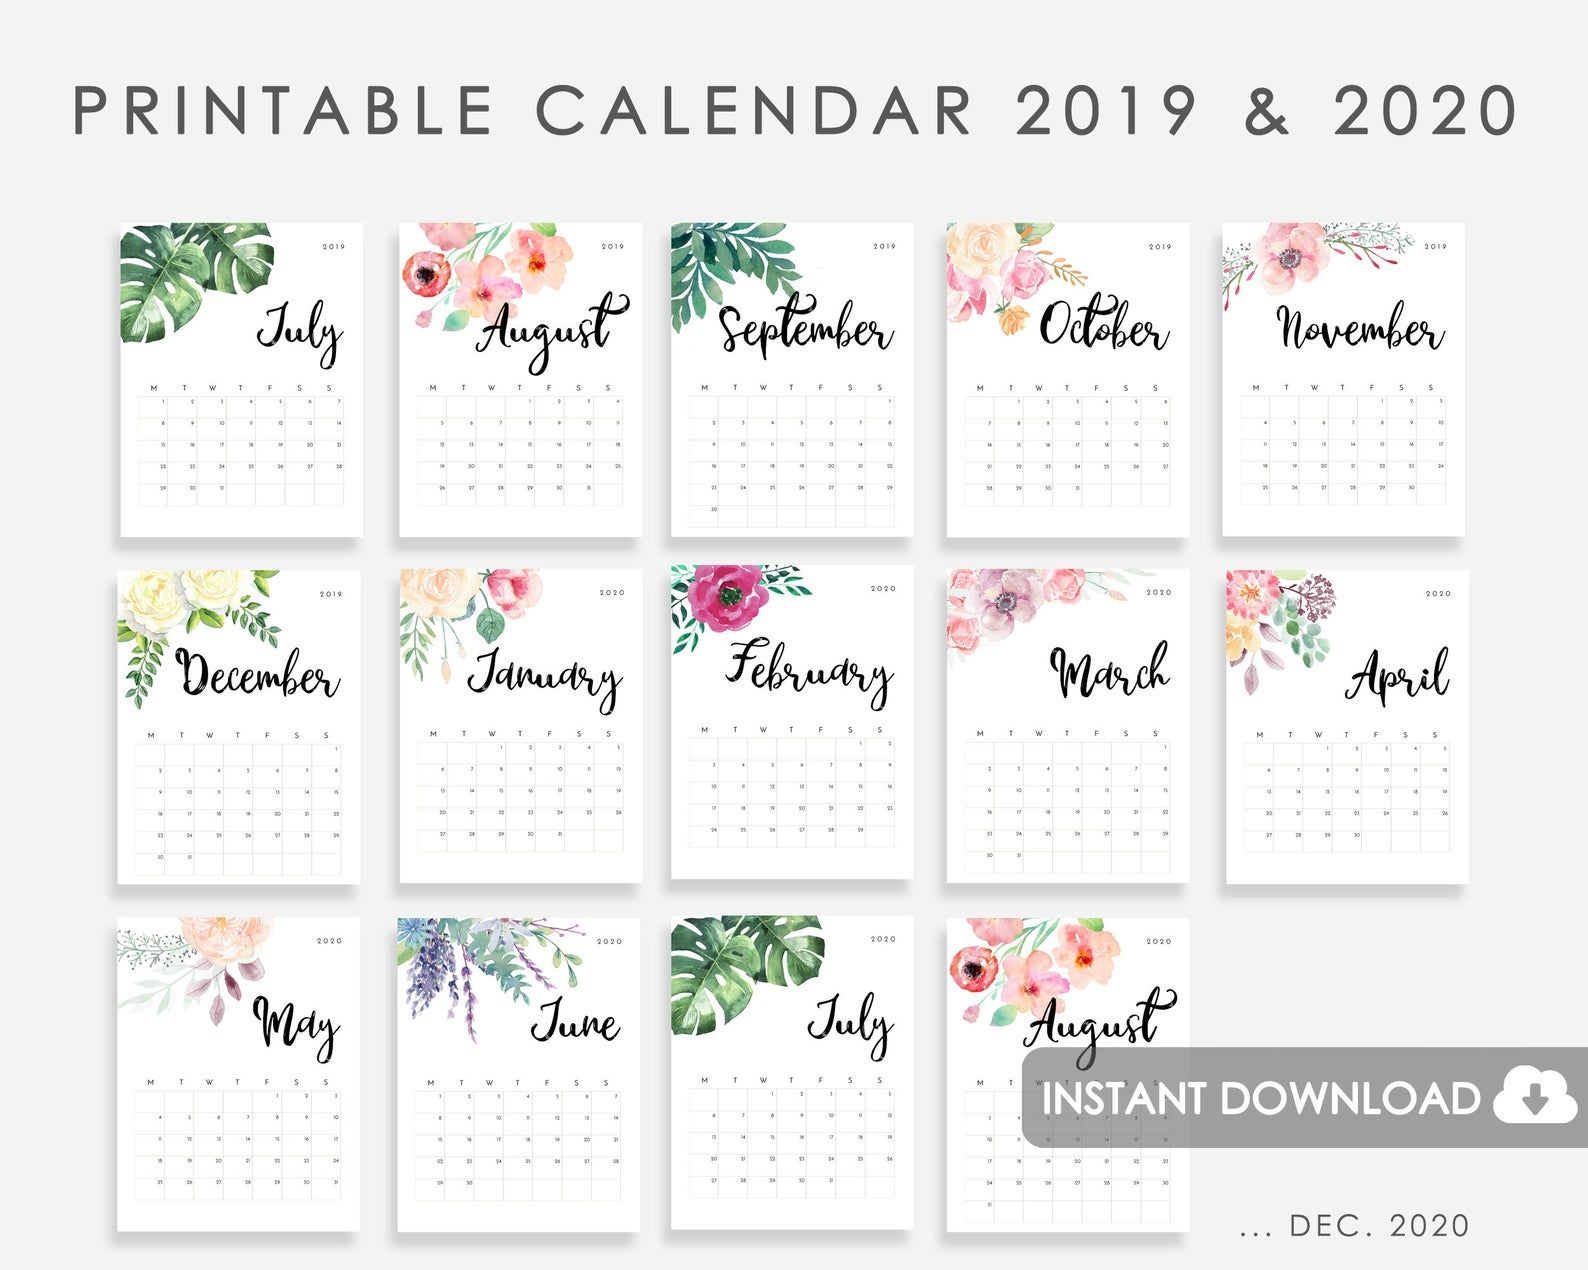 Calendar 2019 2020 Printable Calendar Watercolor Flowers 2019